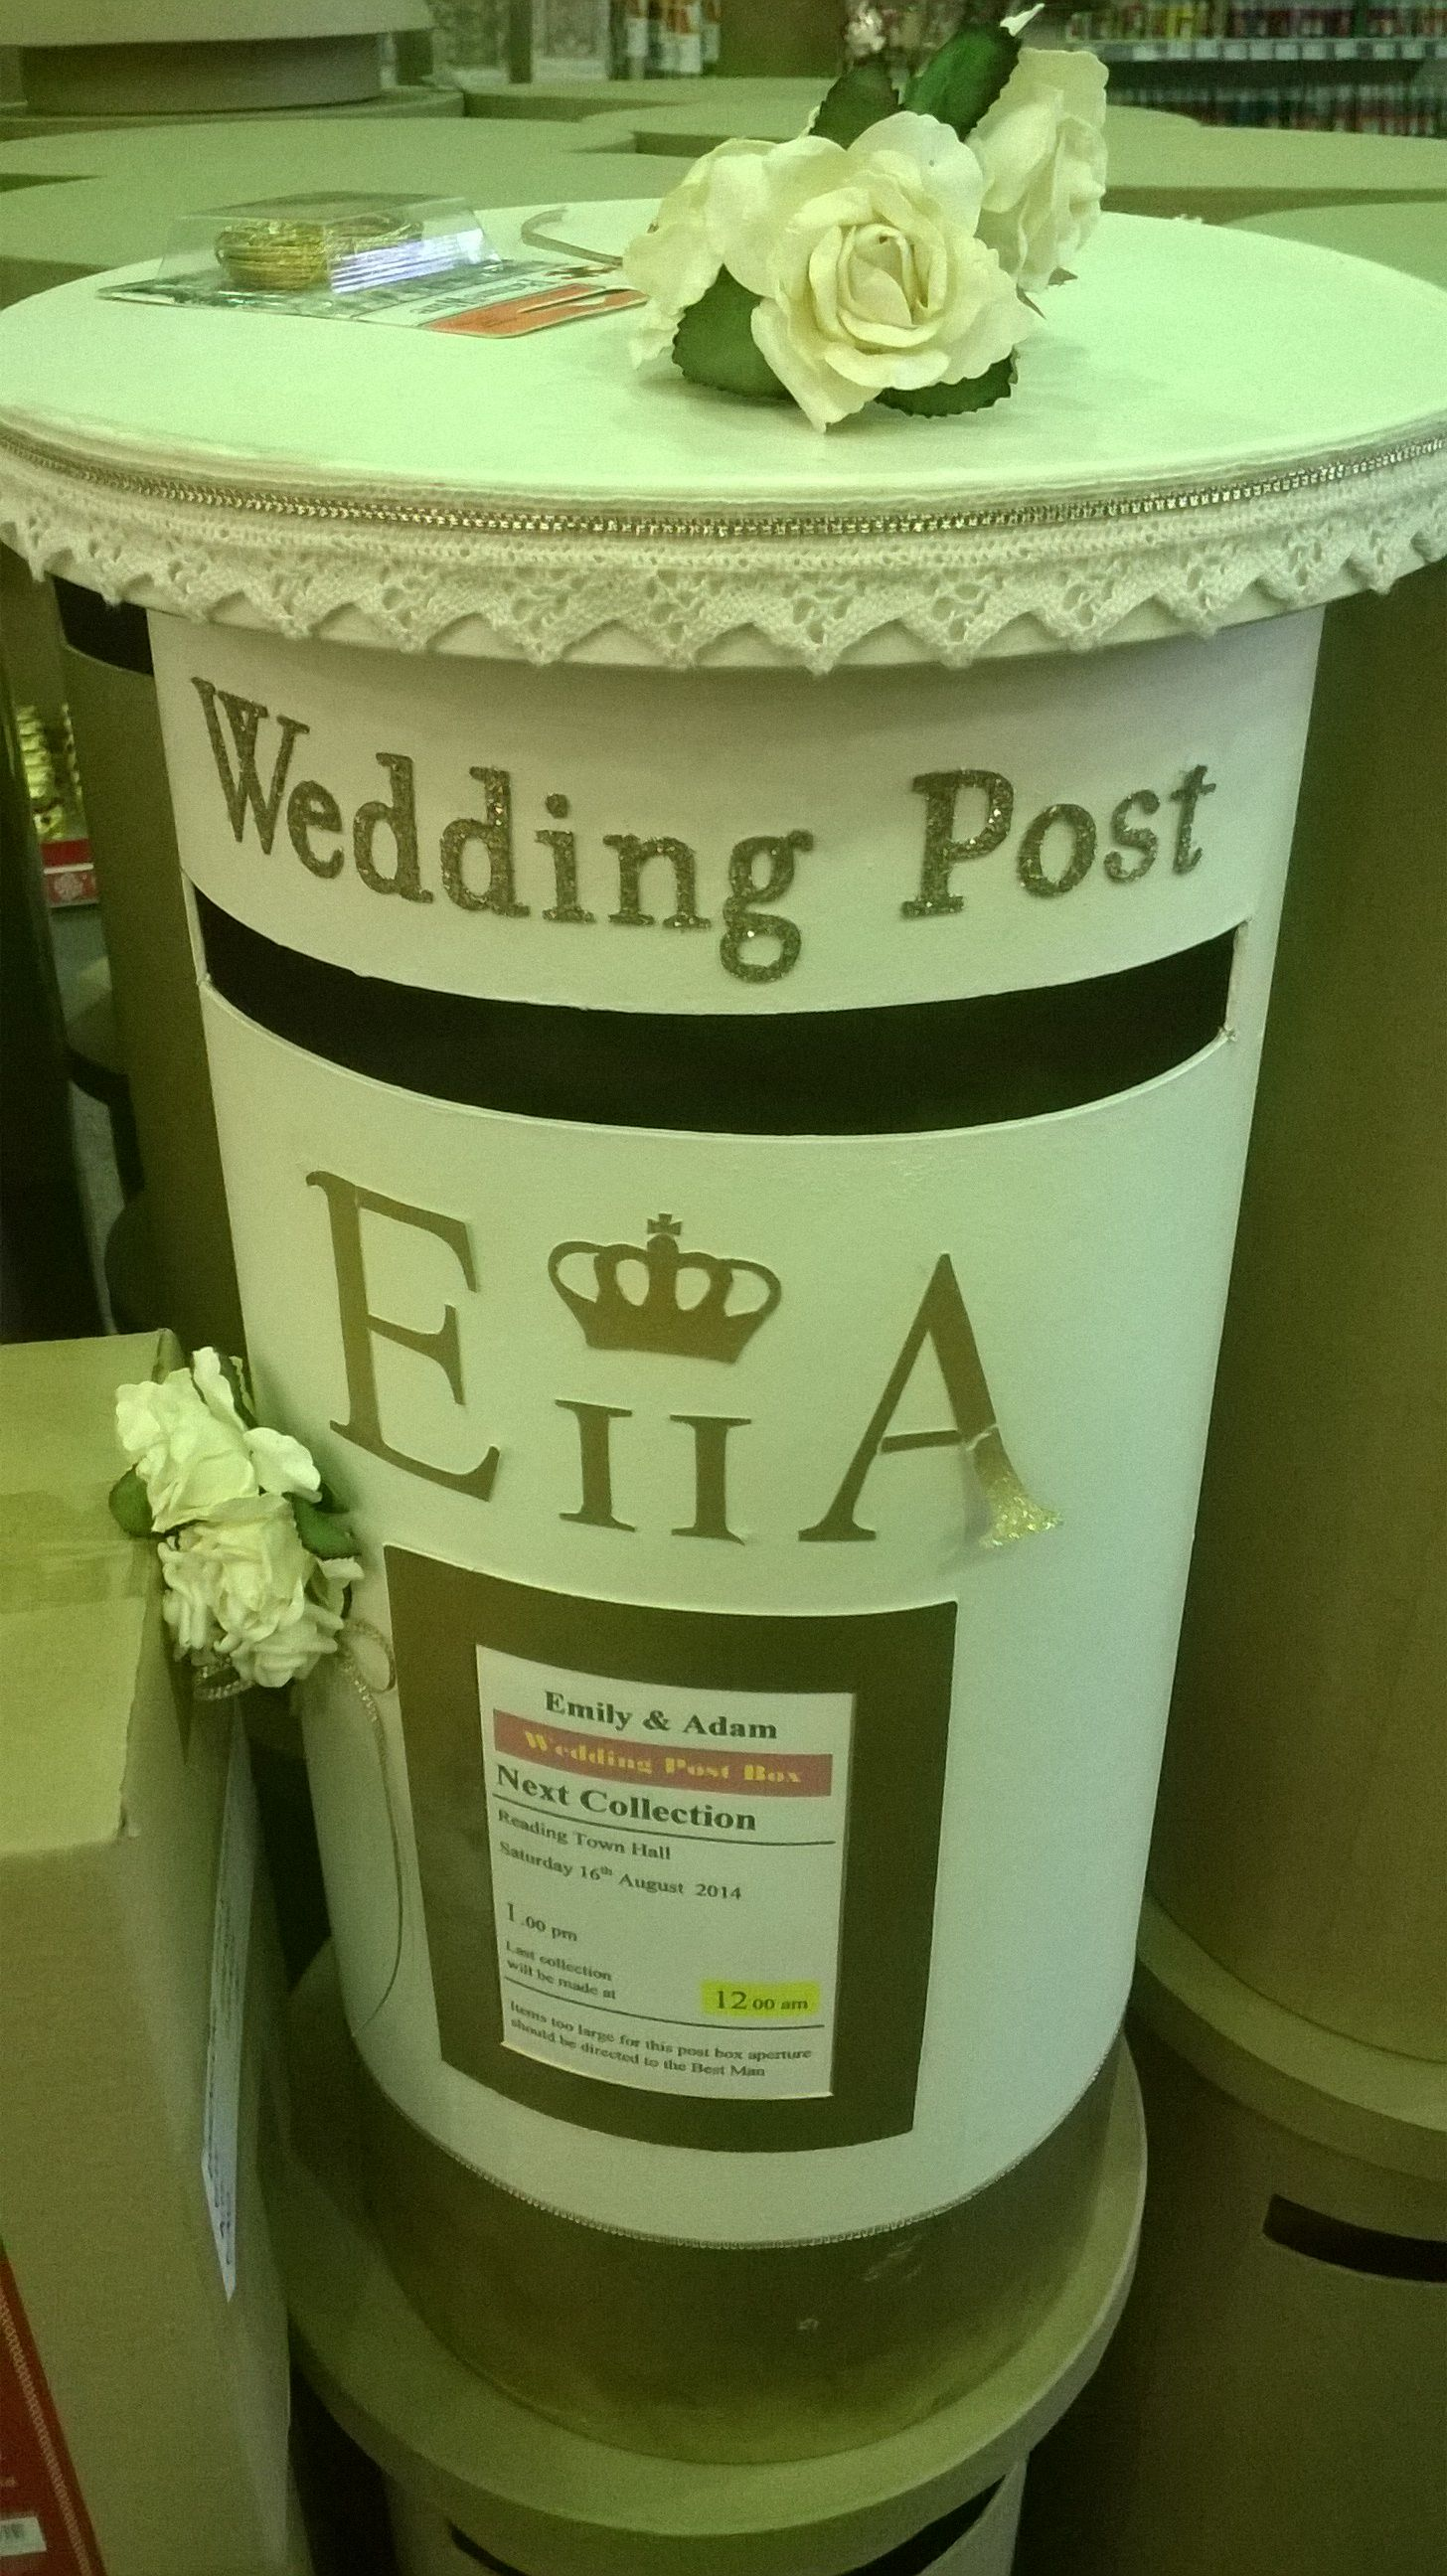 Wedding post box decorations  Pin de Fluff en wedding decor  Pinterest  Franceses